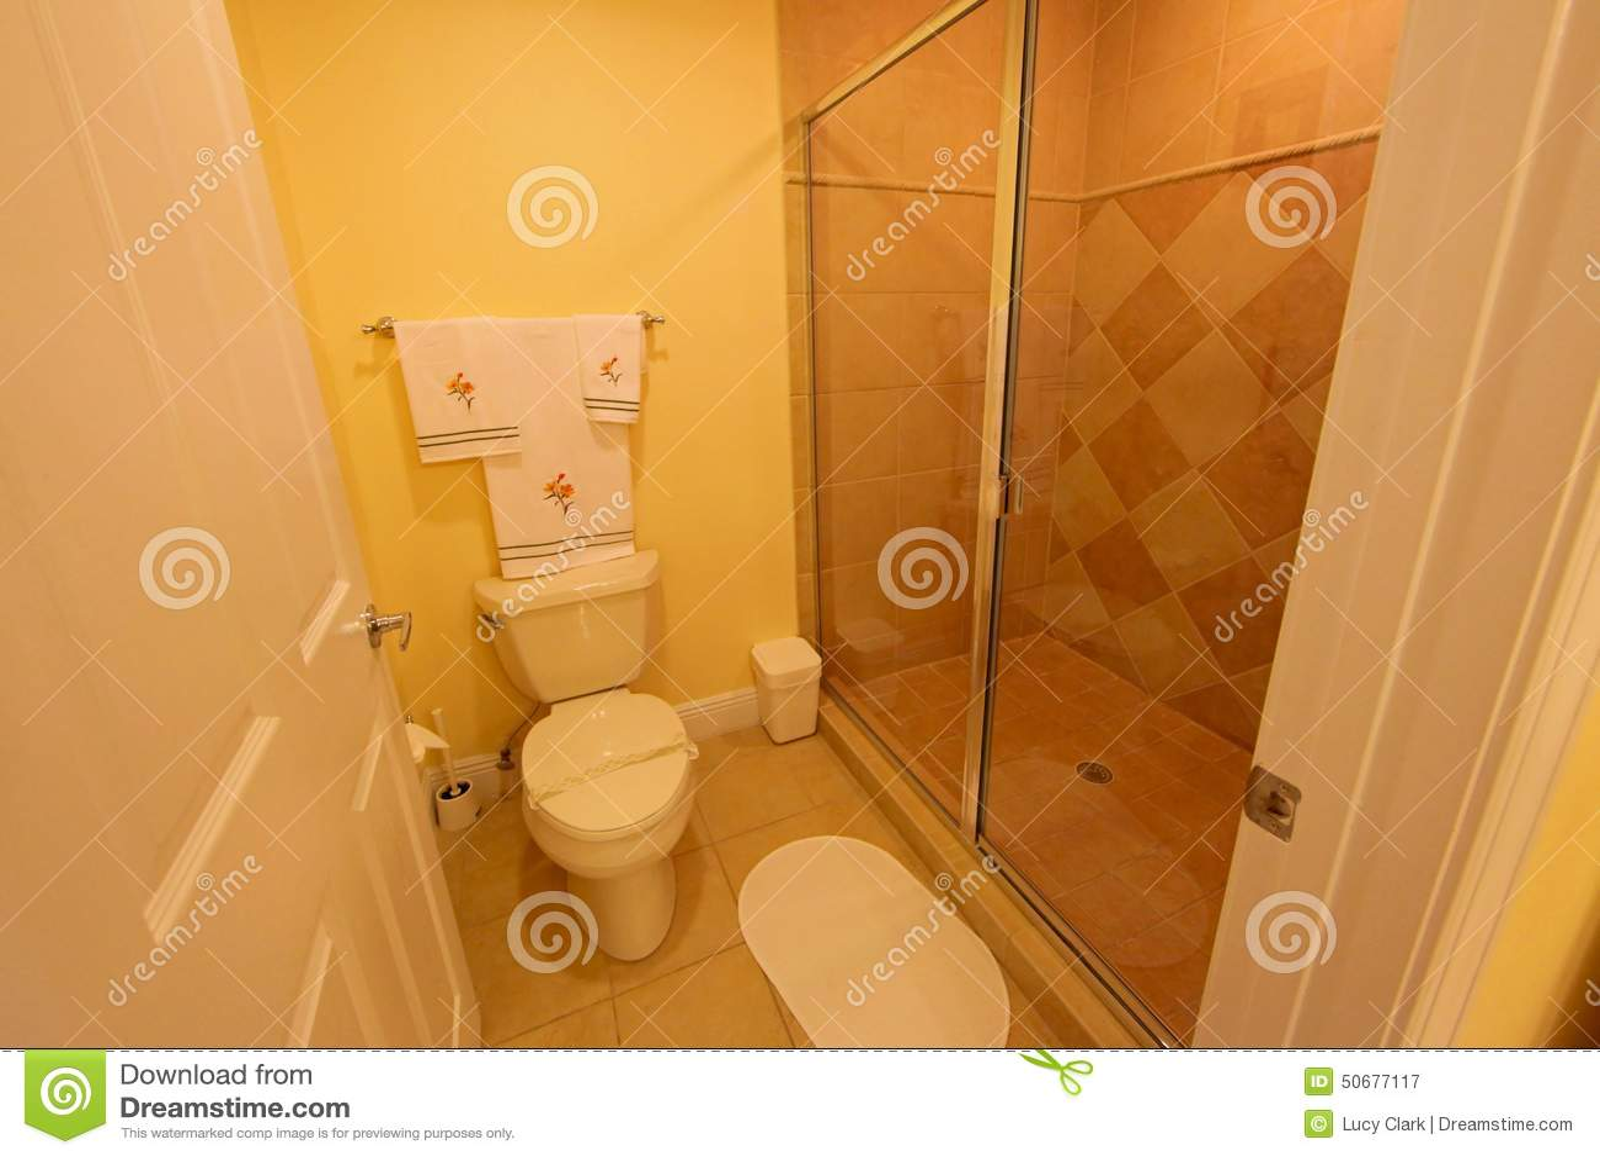 Download 卫生间 库存图片. 图片 包括有 空间, 铺磁砖, 龙头, 洗手间, 机柜, 重要资料, 虚荣, 瓦片, 室内 - 50677117